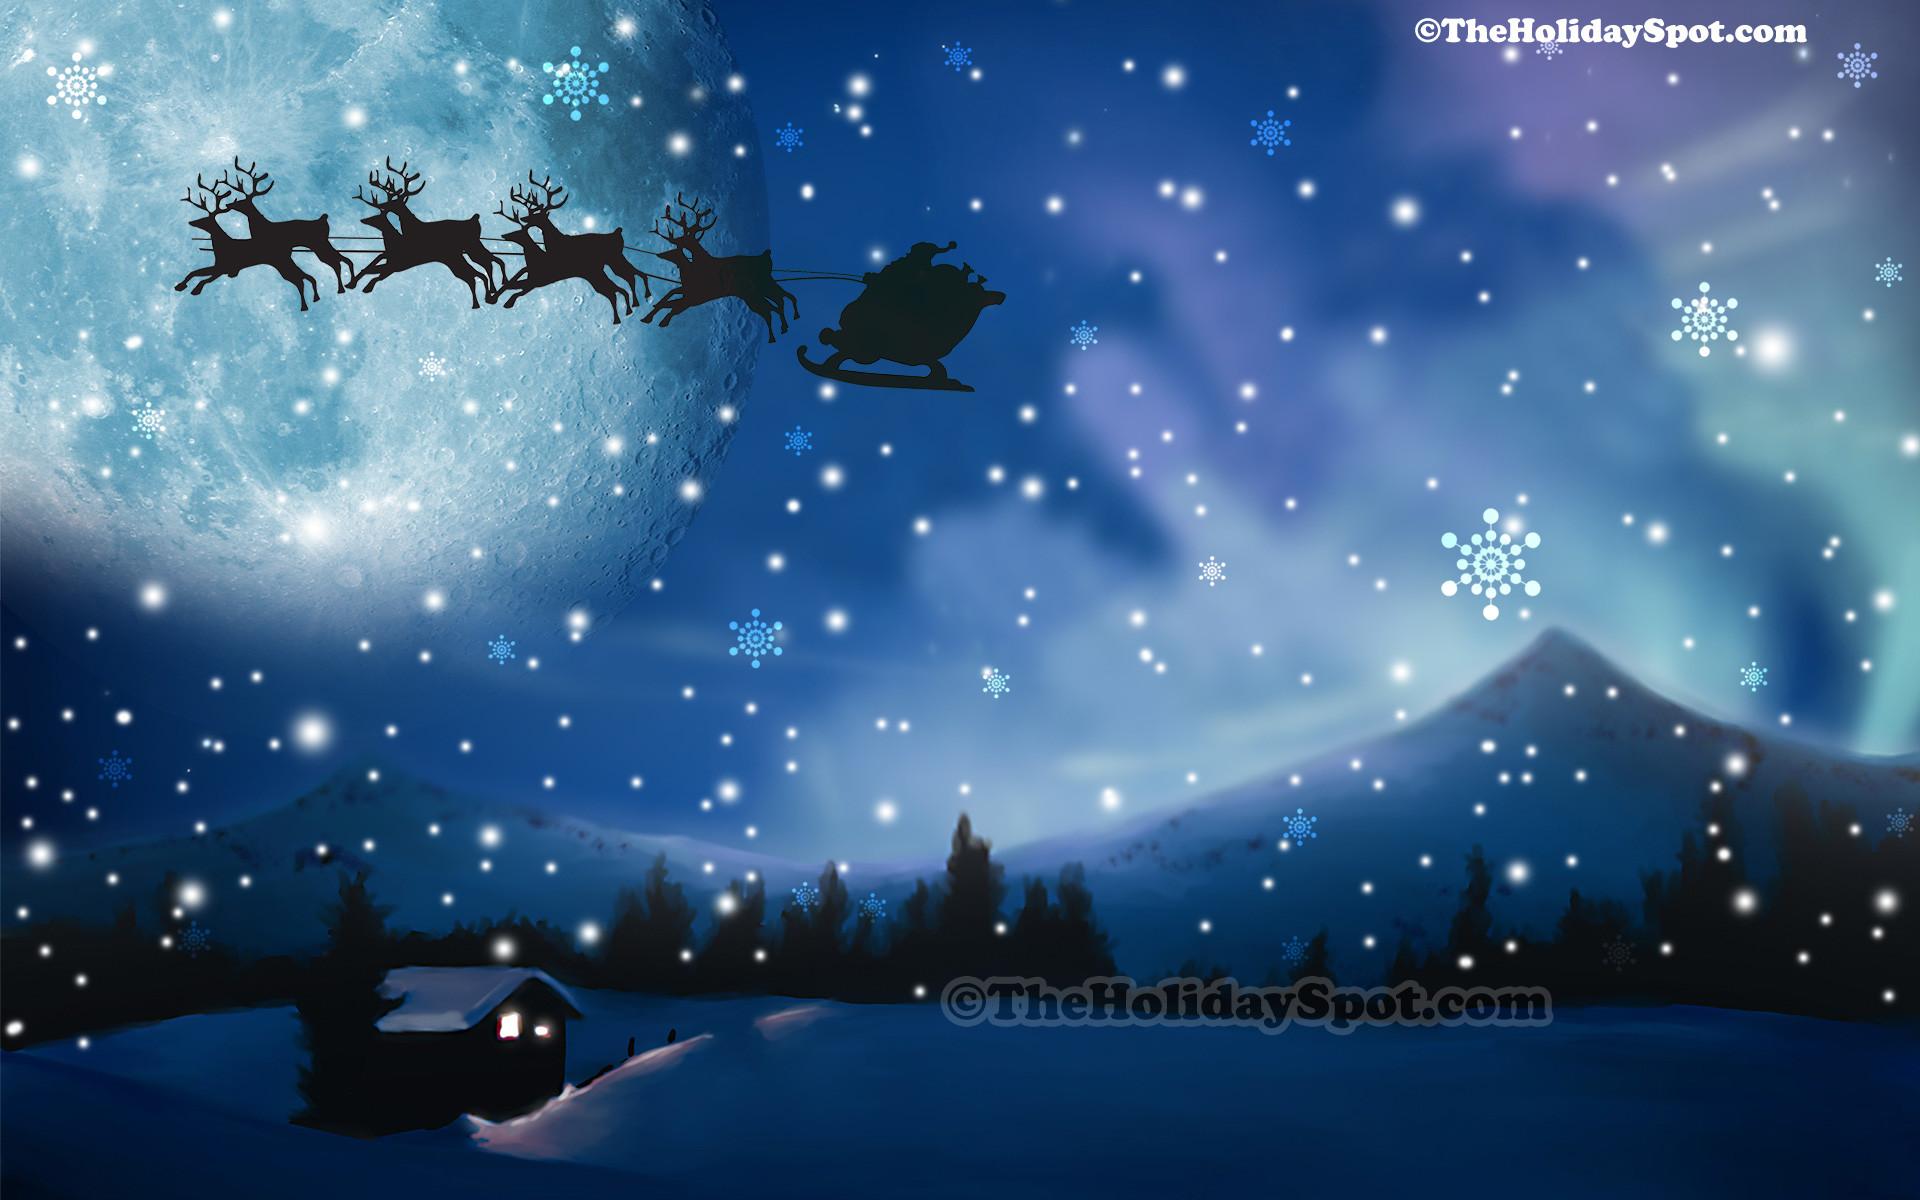 Christmas Wallpaper and Screensavers 60 images